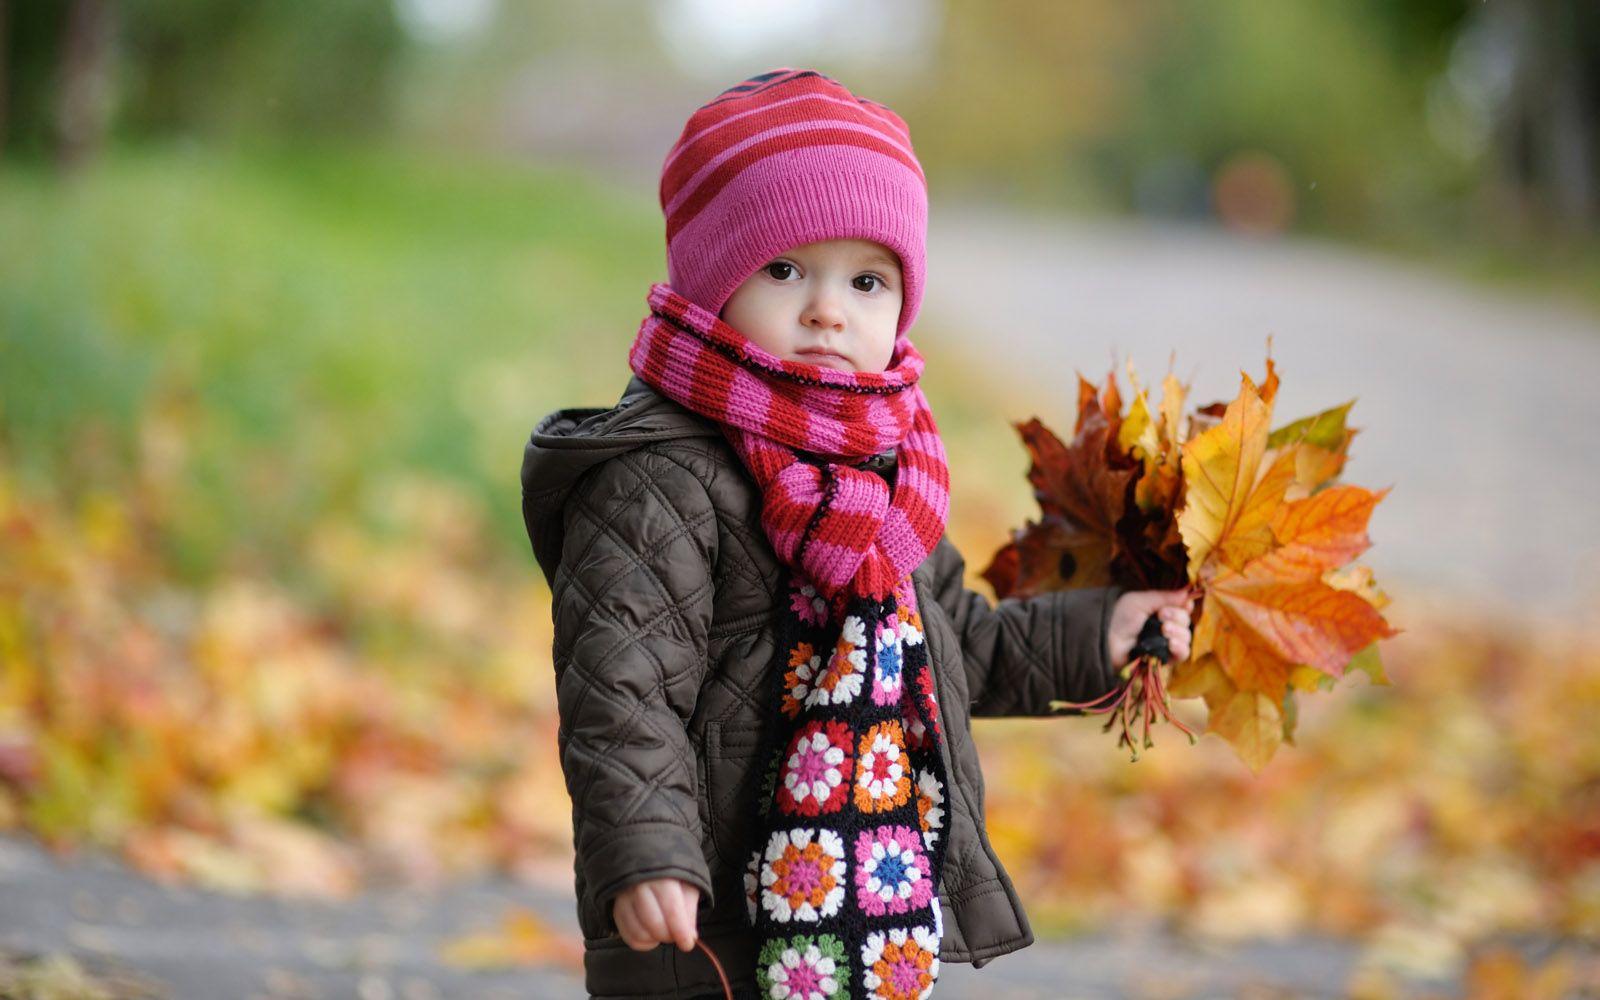 Cute baby in autumn wallpaper pinterest 3d wallpaper cute baby in autumn wallpaper voltagebd Choice Image